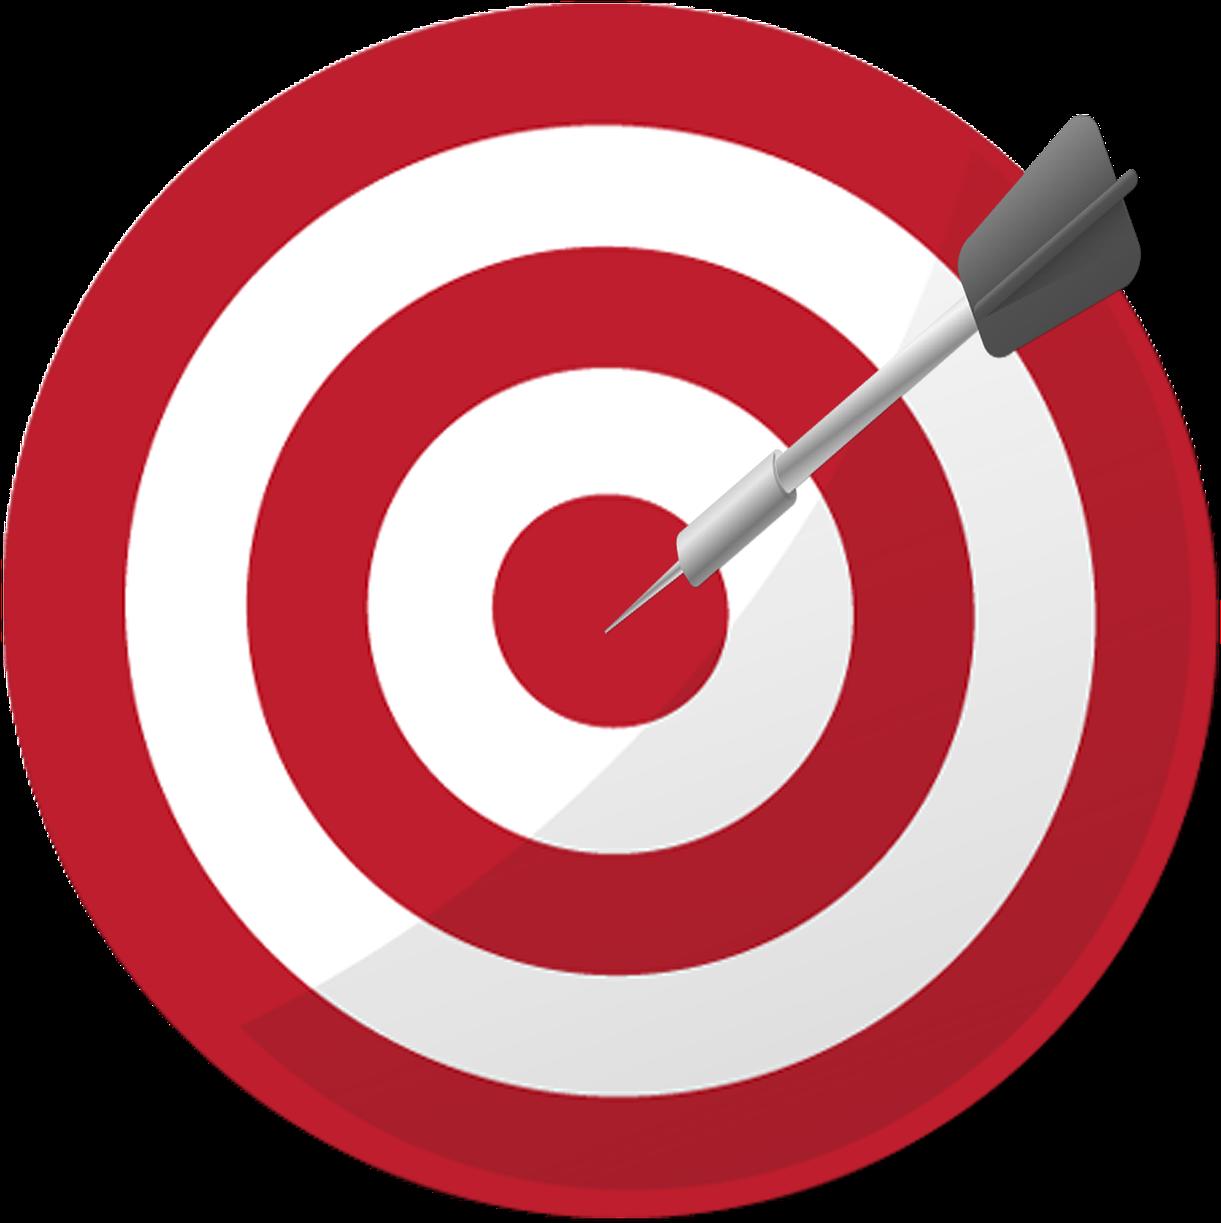 Goals Clipart Png - Dart Board Goal , Transparent Cartoon